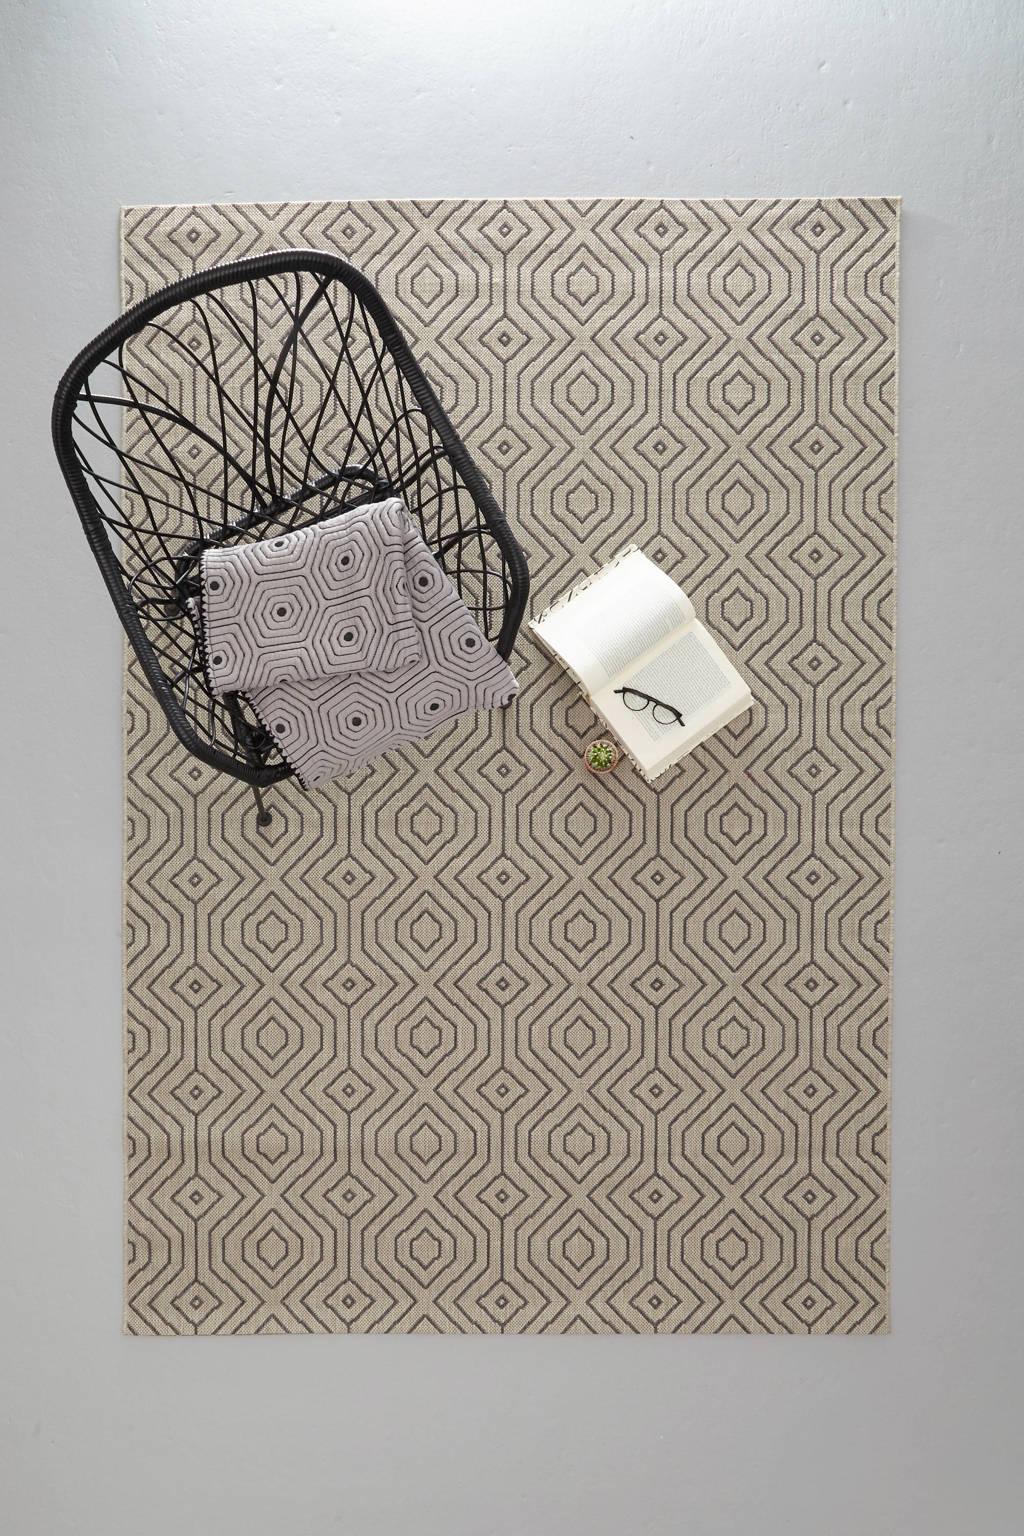 whkmp's own vloerkleed (230x160 xcm)  (230x160 cm), Zand